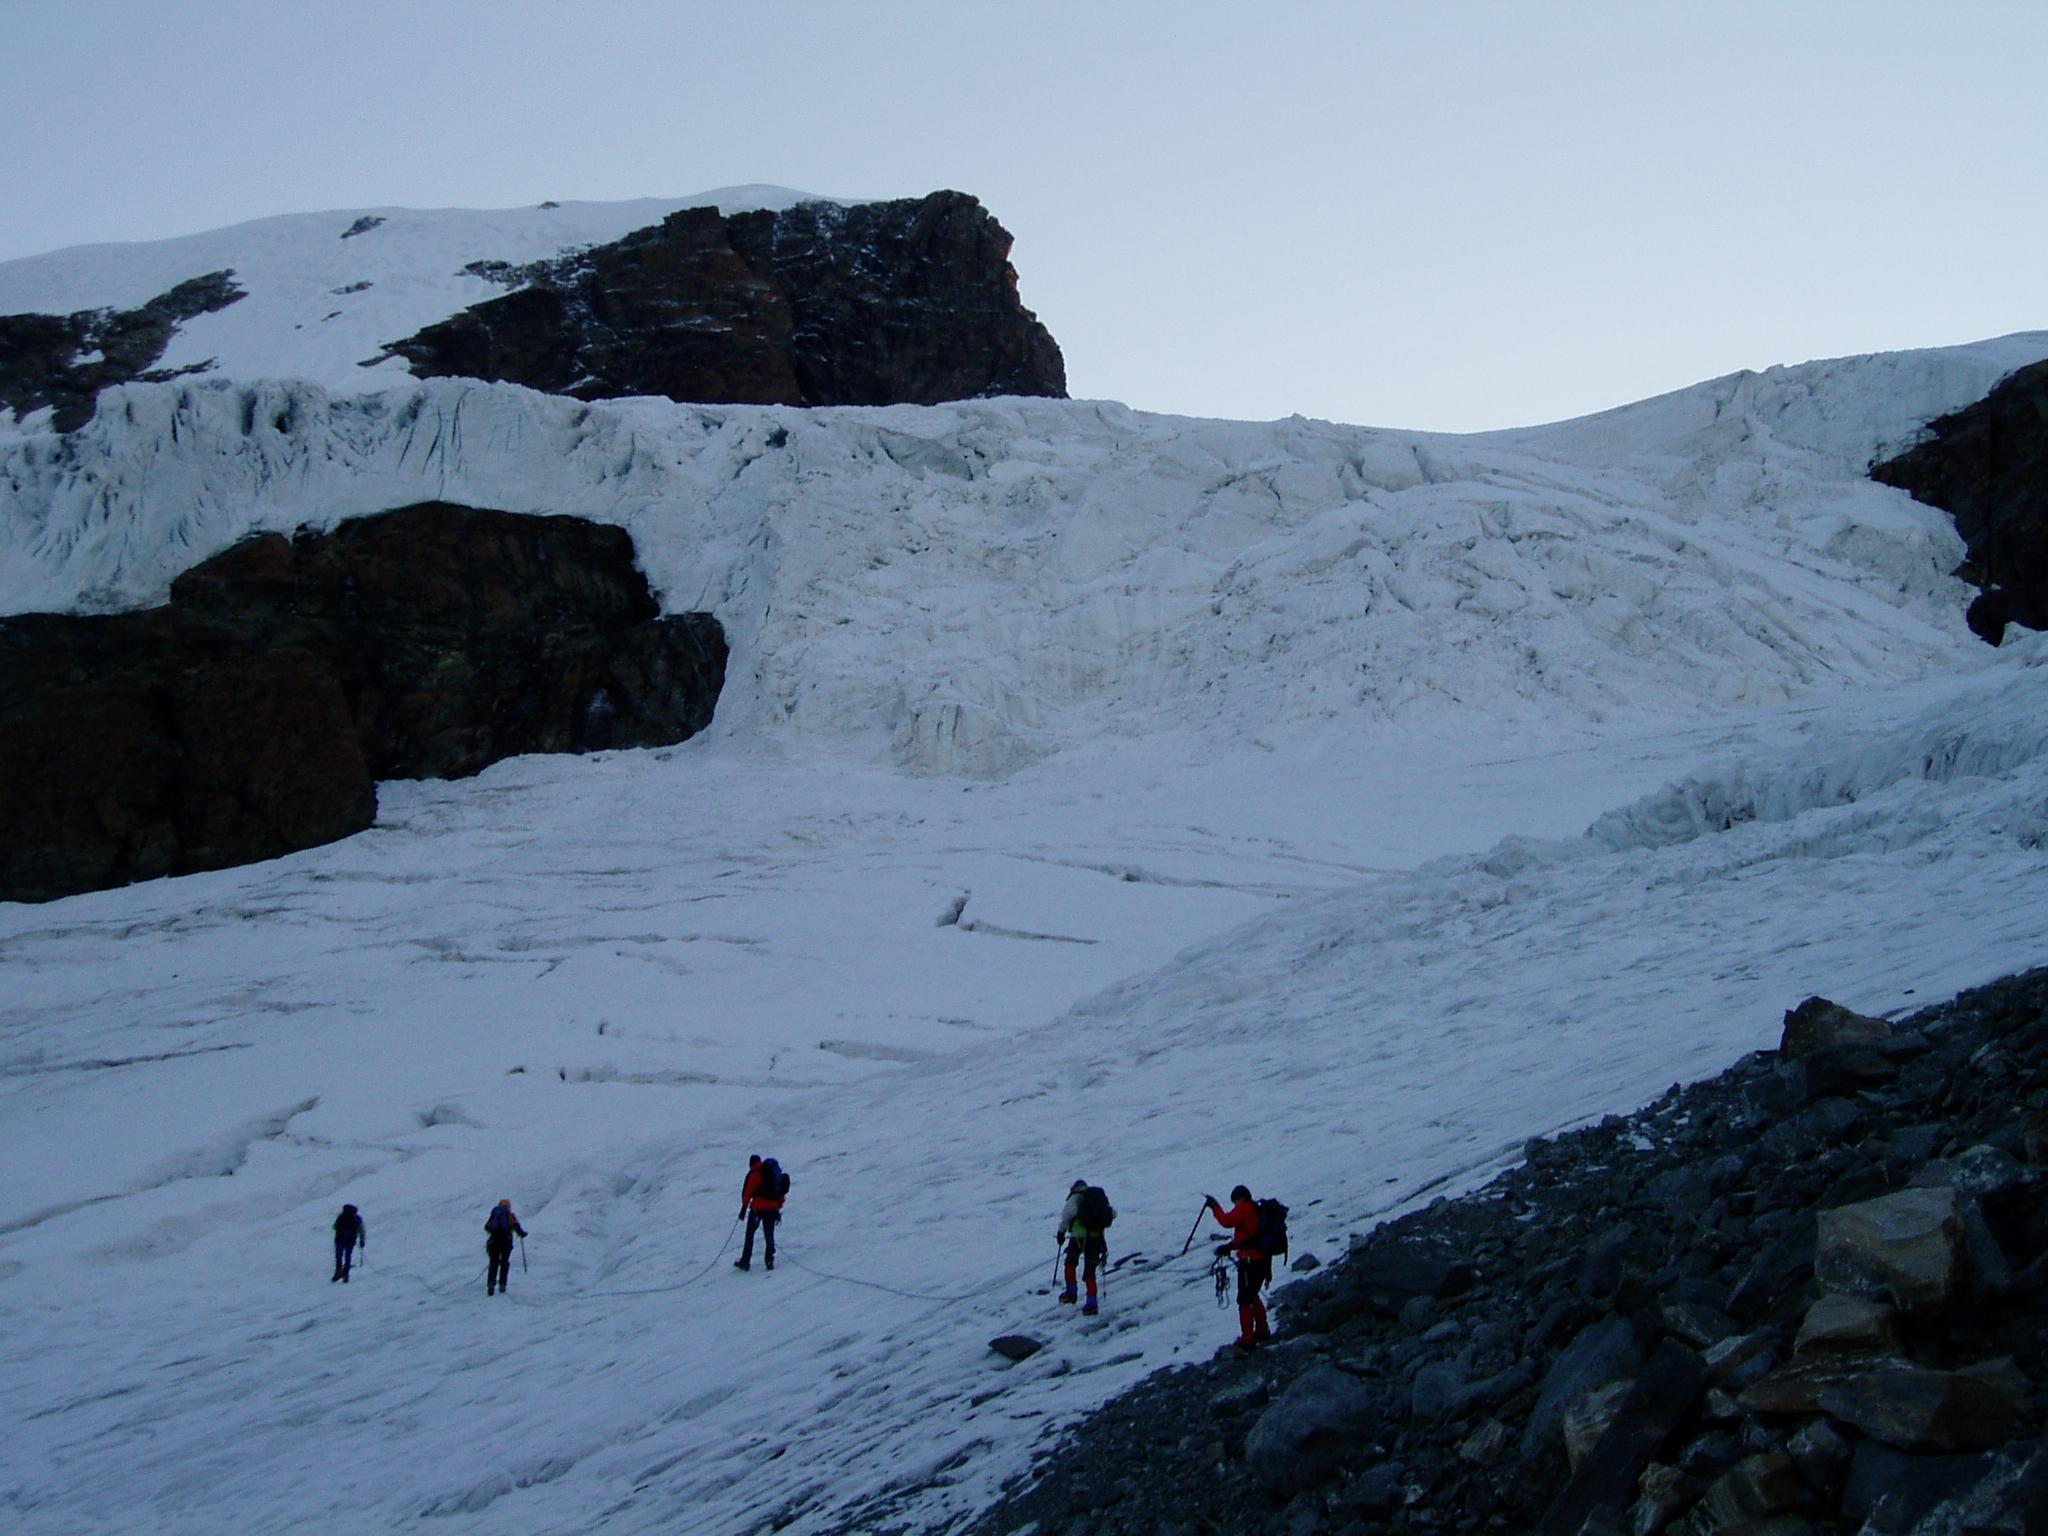 Vroeg de gletsjer op bij de Ayashütte